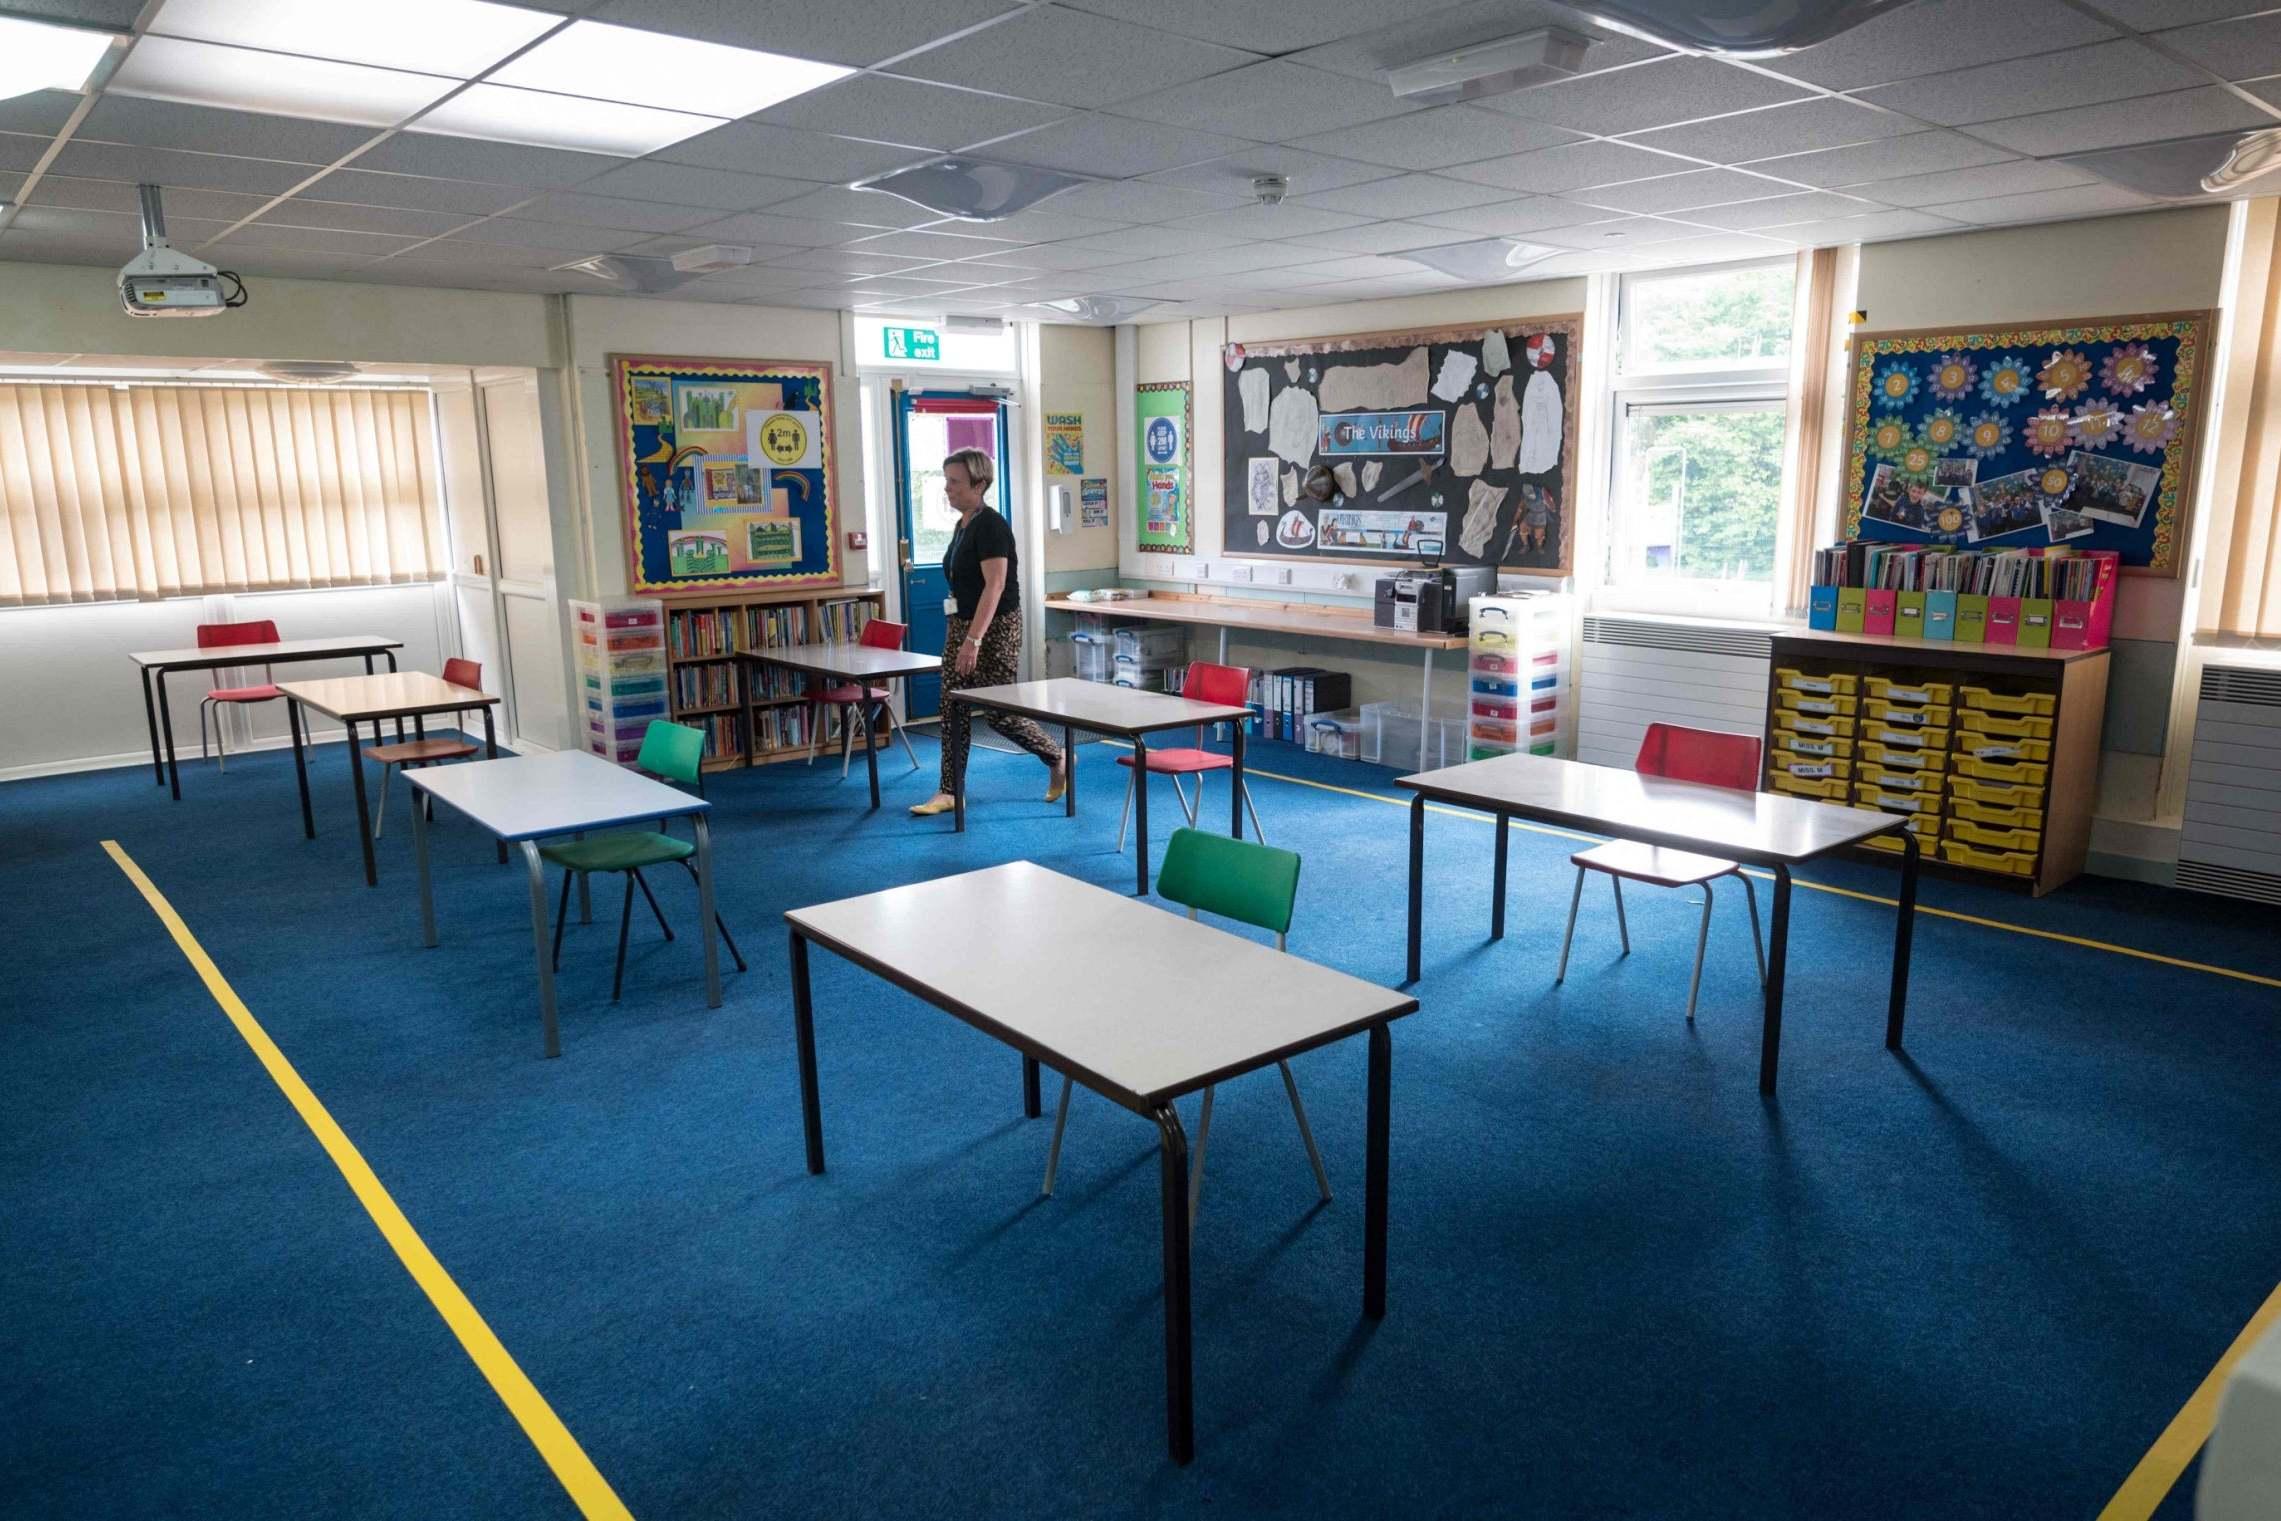 Coronavirus: Education staff fear return to school, survey finds thumbnail